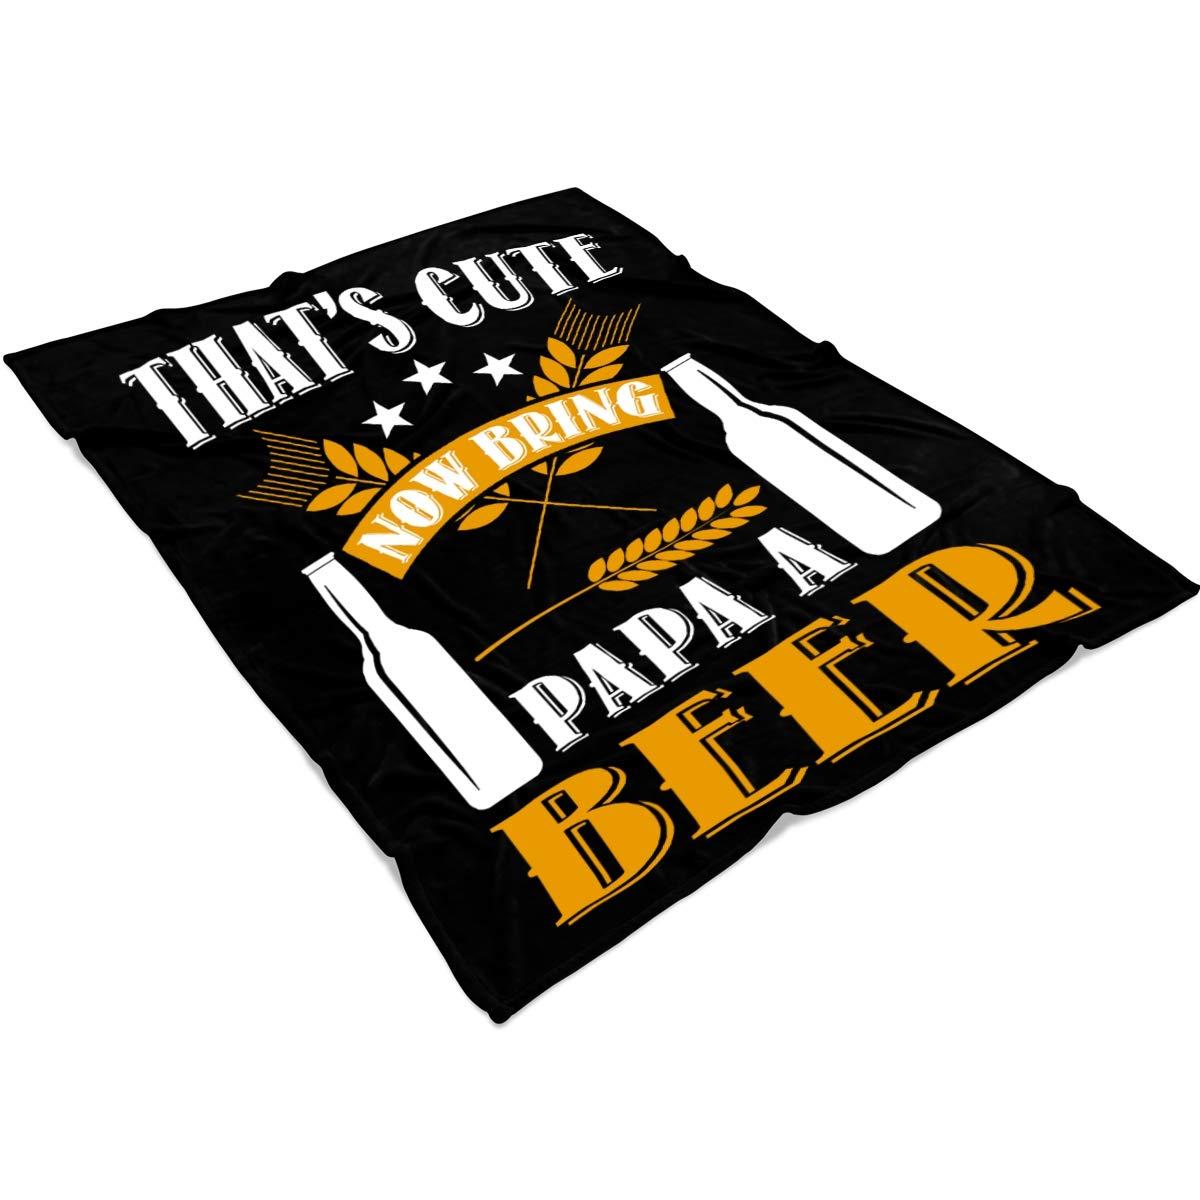 Amazon.com: COLUSTORE Thats Cute Soft Fleece Throw Blanket ...